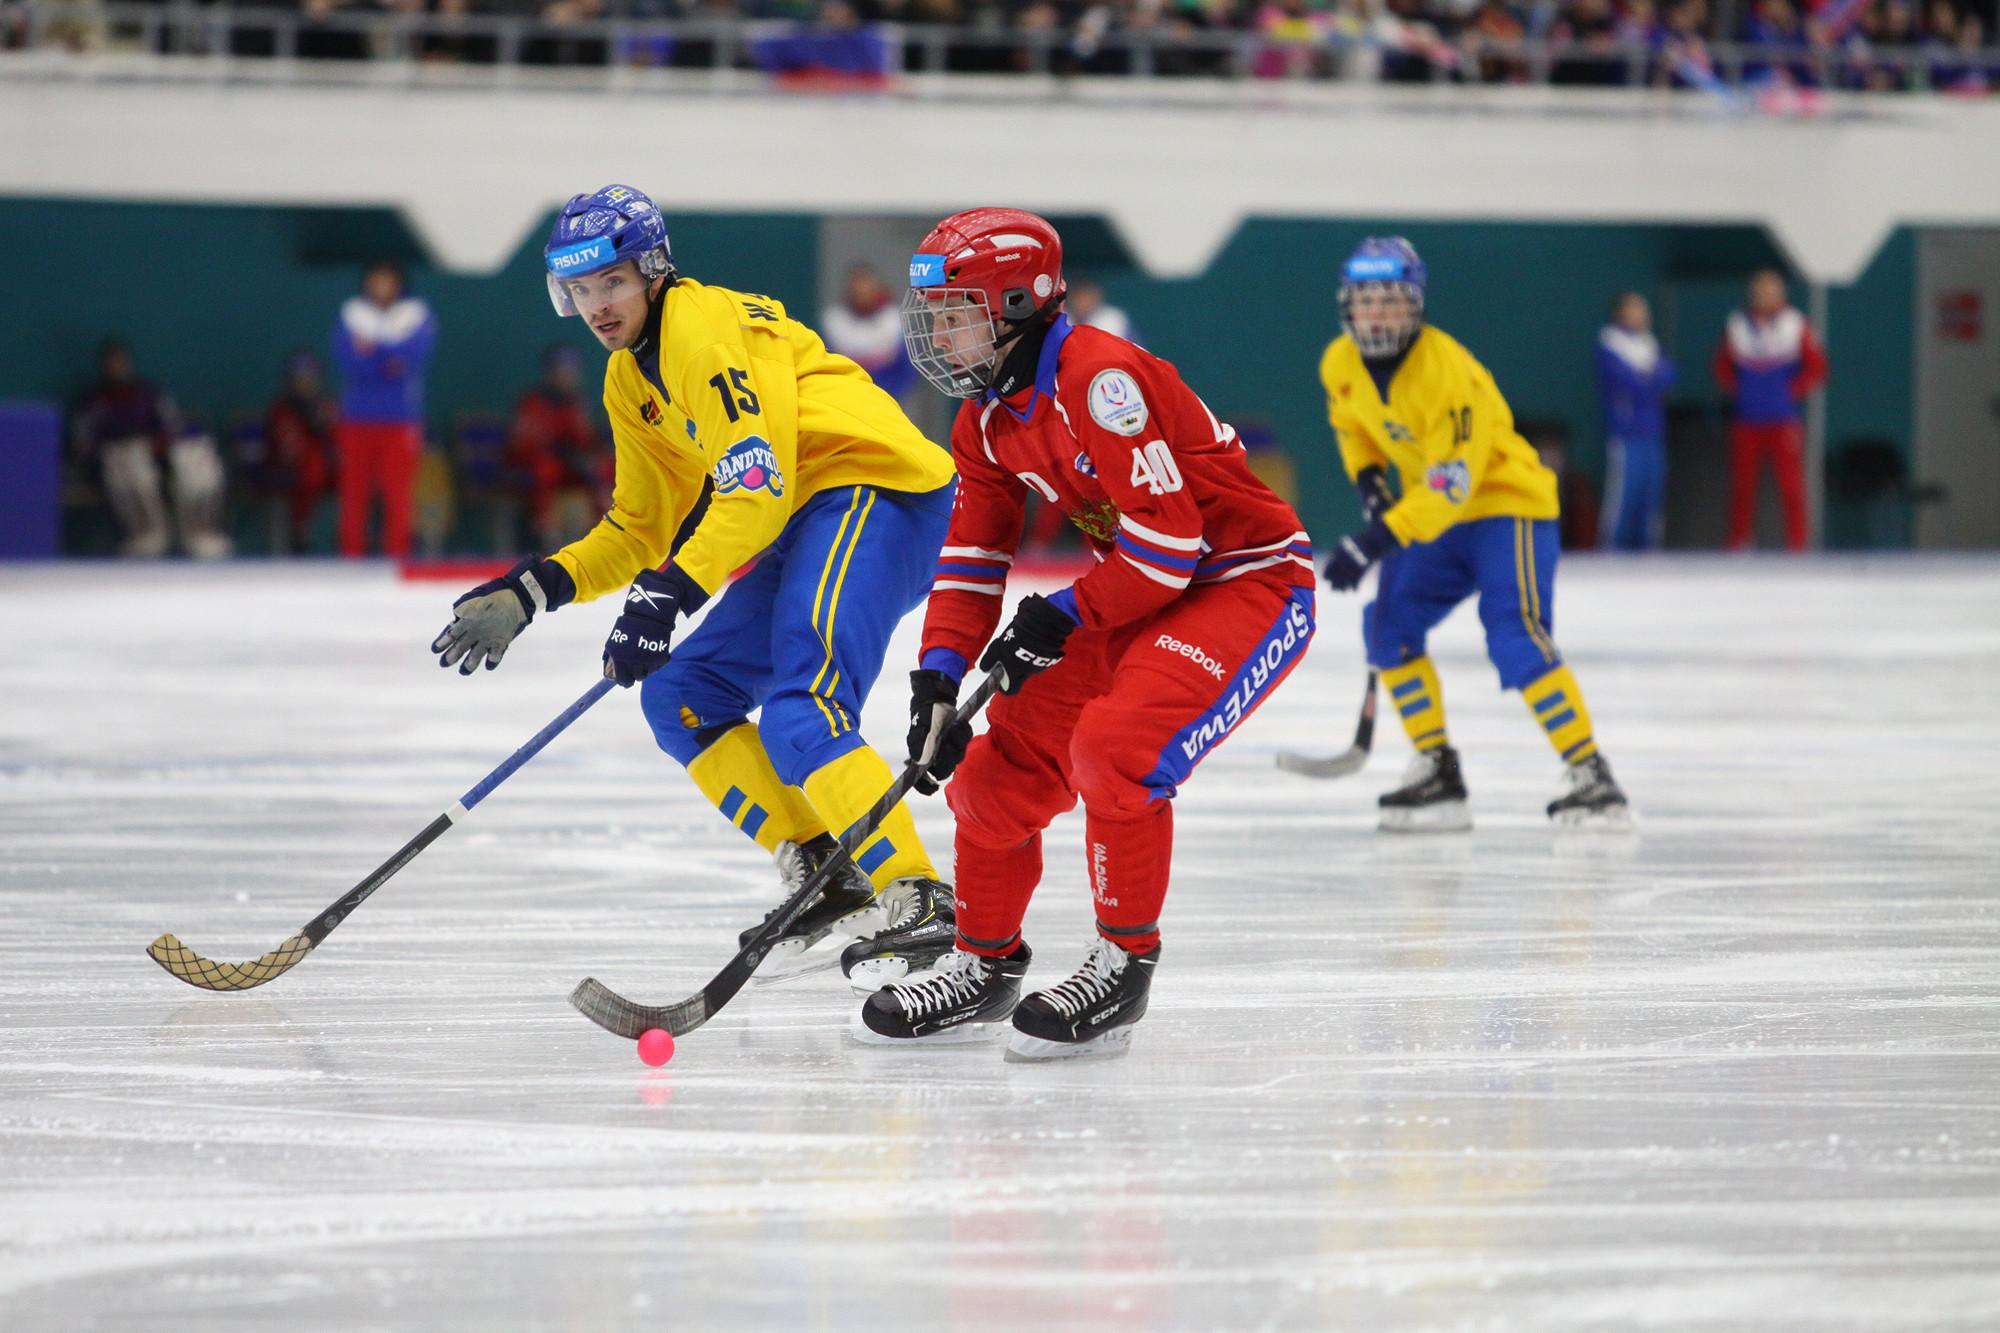 Hosts Russia take gold in the men's bandy final at Krasnoyarsk 2019